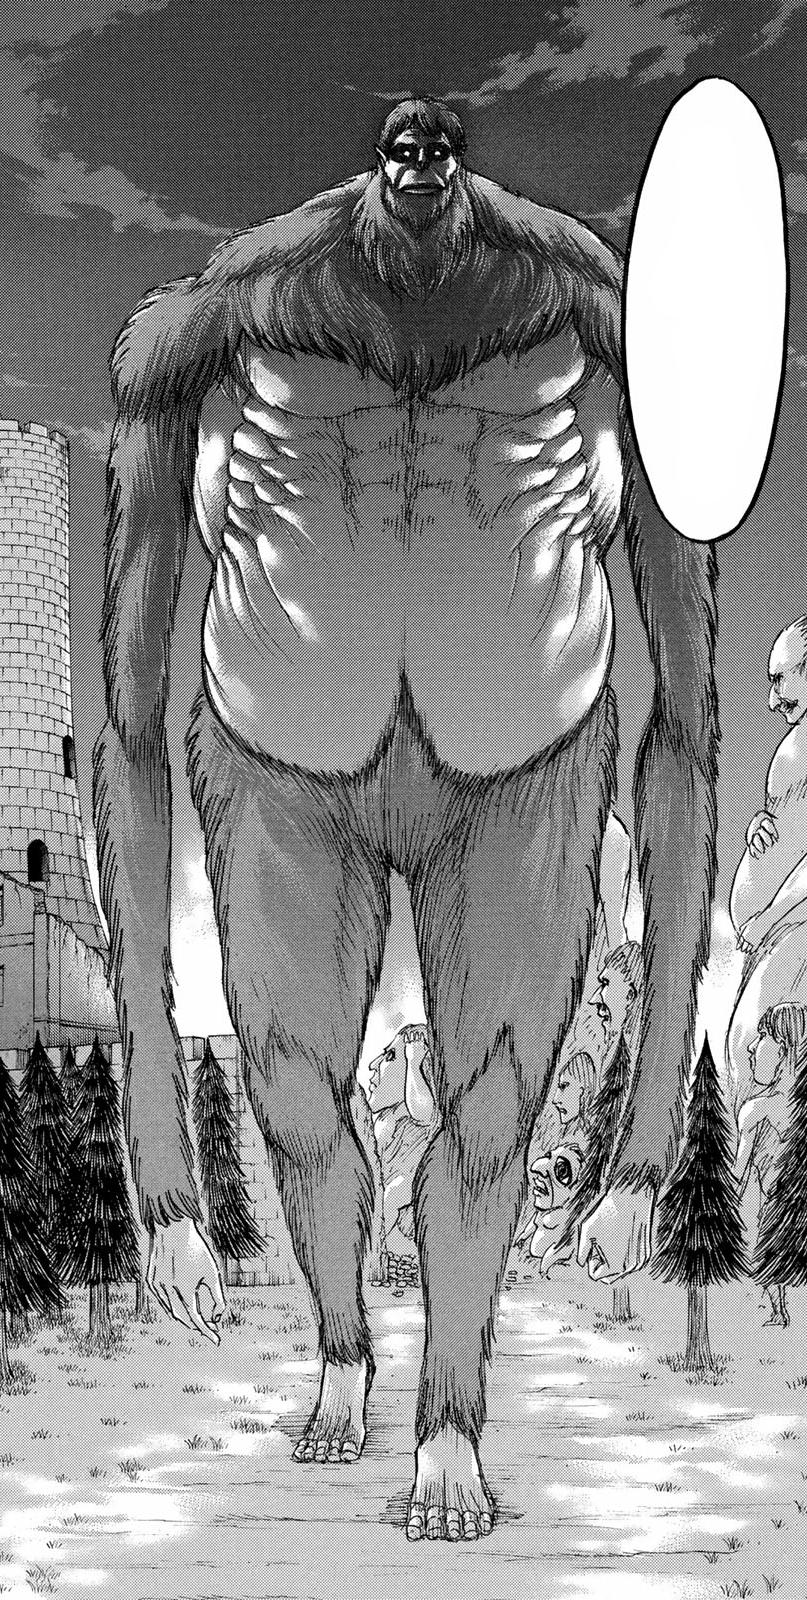 *Spoilers* Beast Titan |AOT| Minecraft Skin